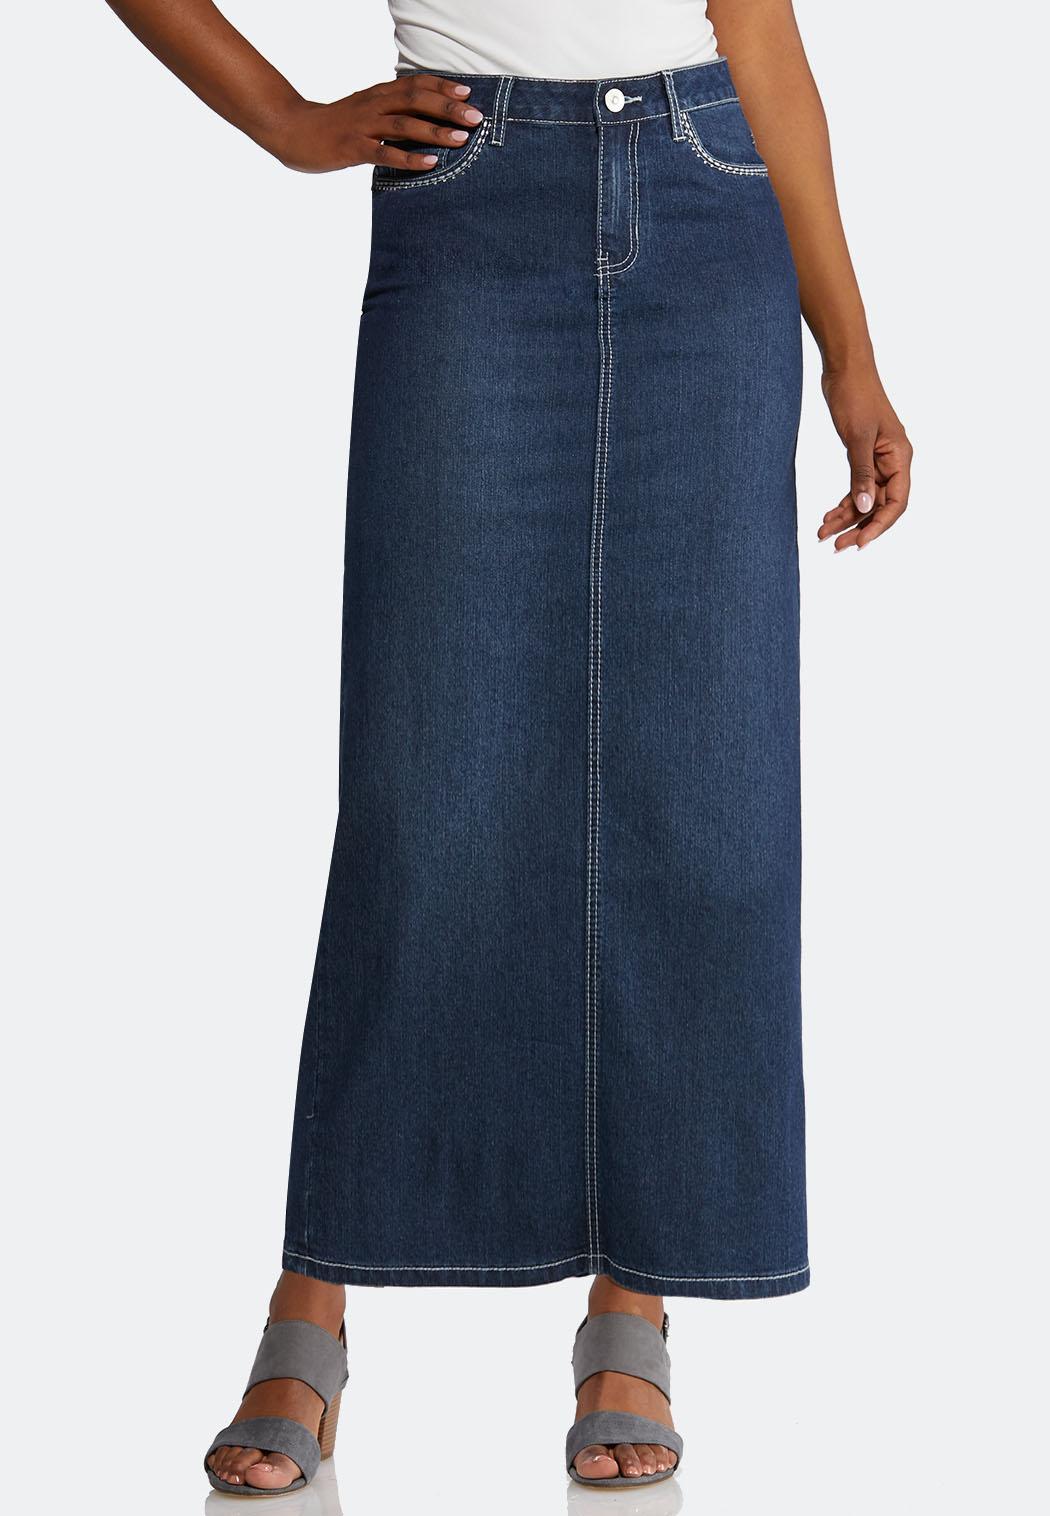 1a3ad2b94c966 Women s Maxi Skirts